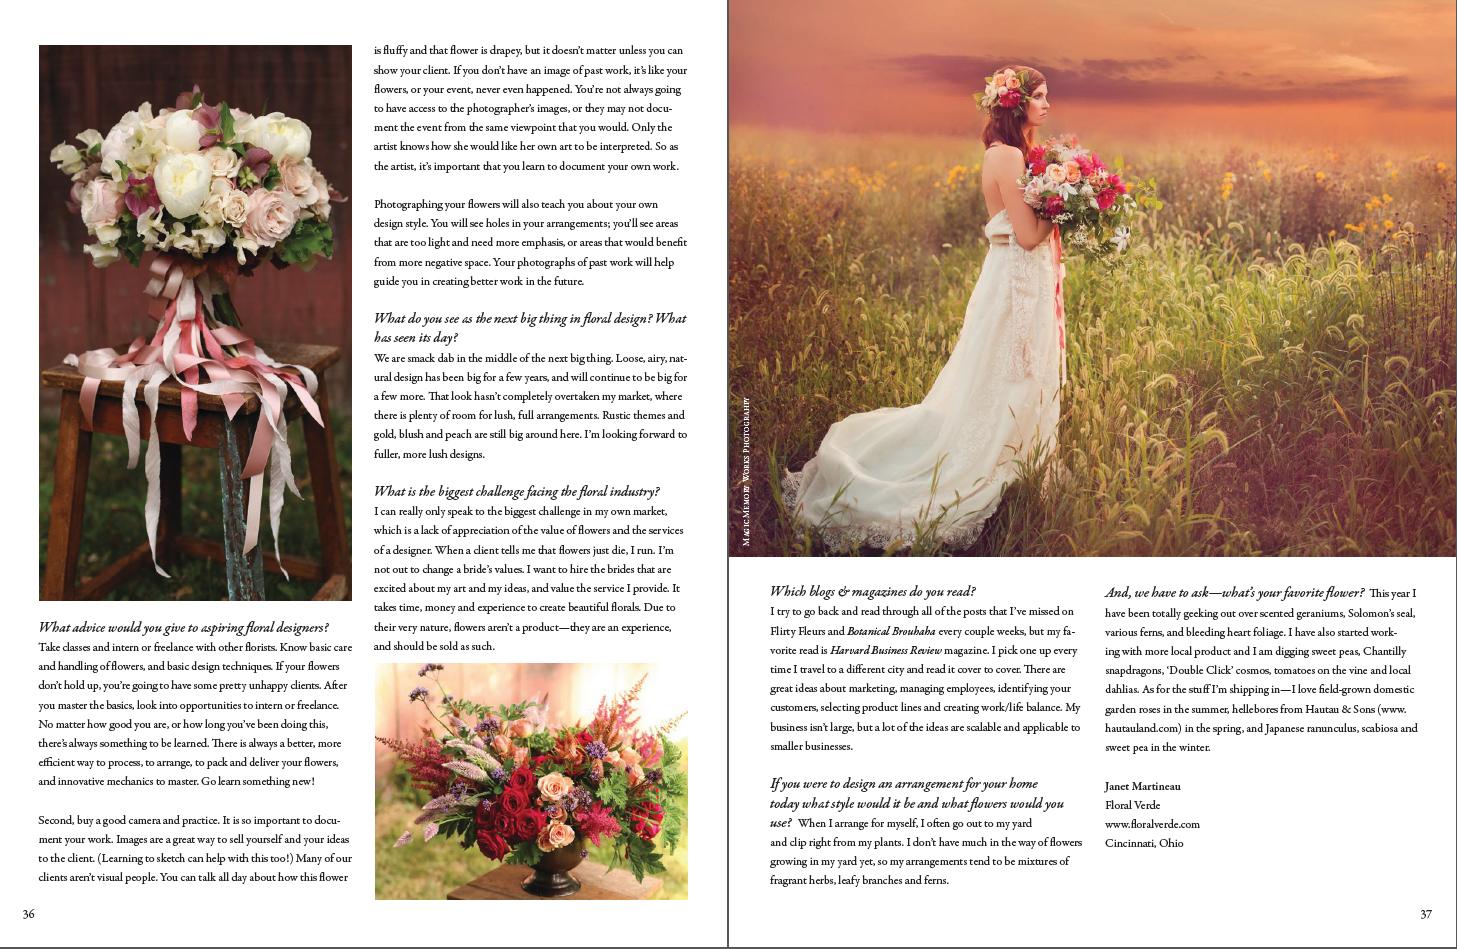 Flirty FleursMagazine , December 2014